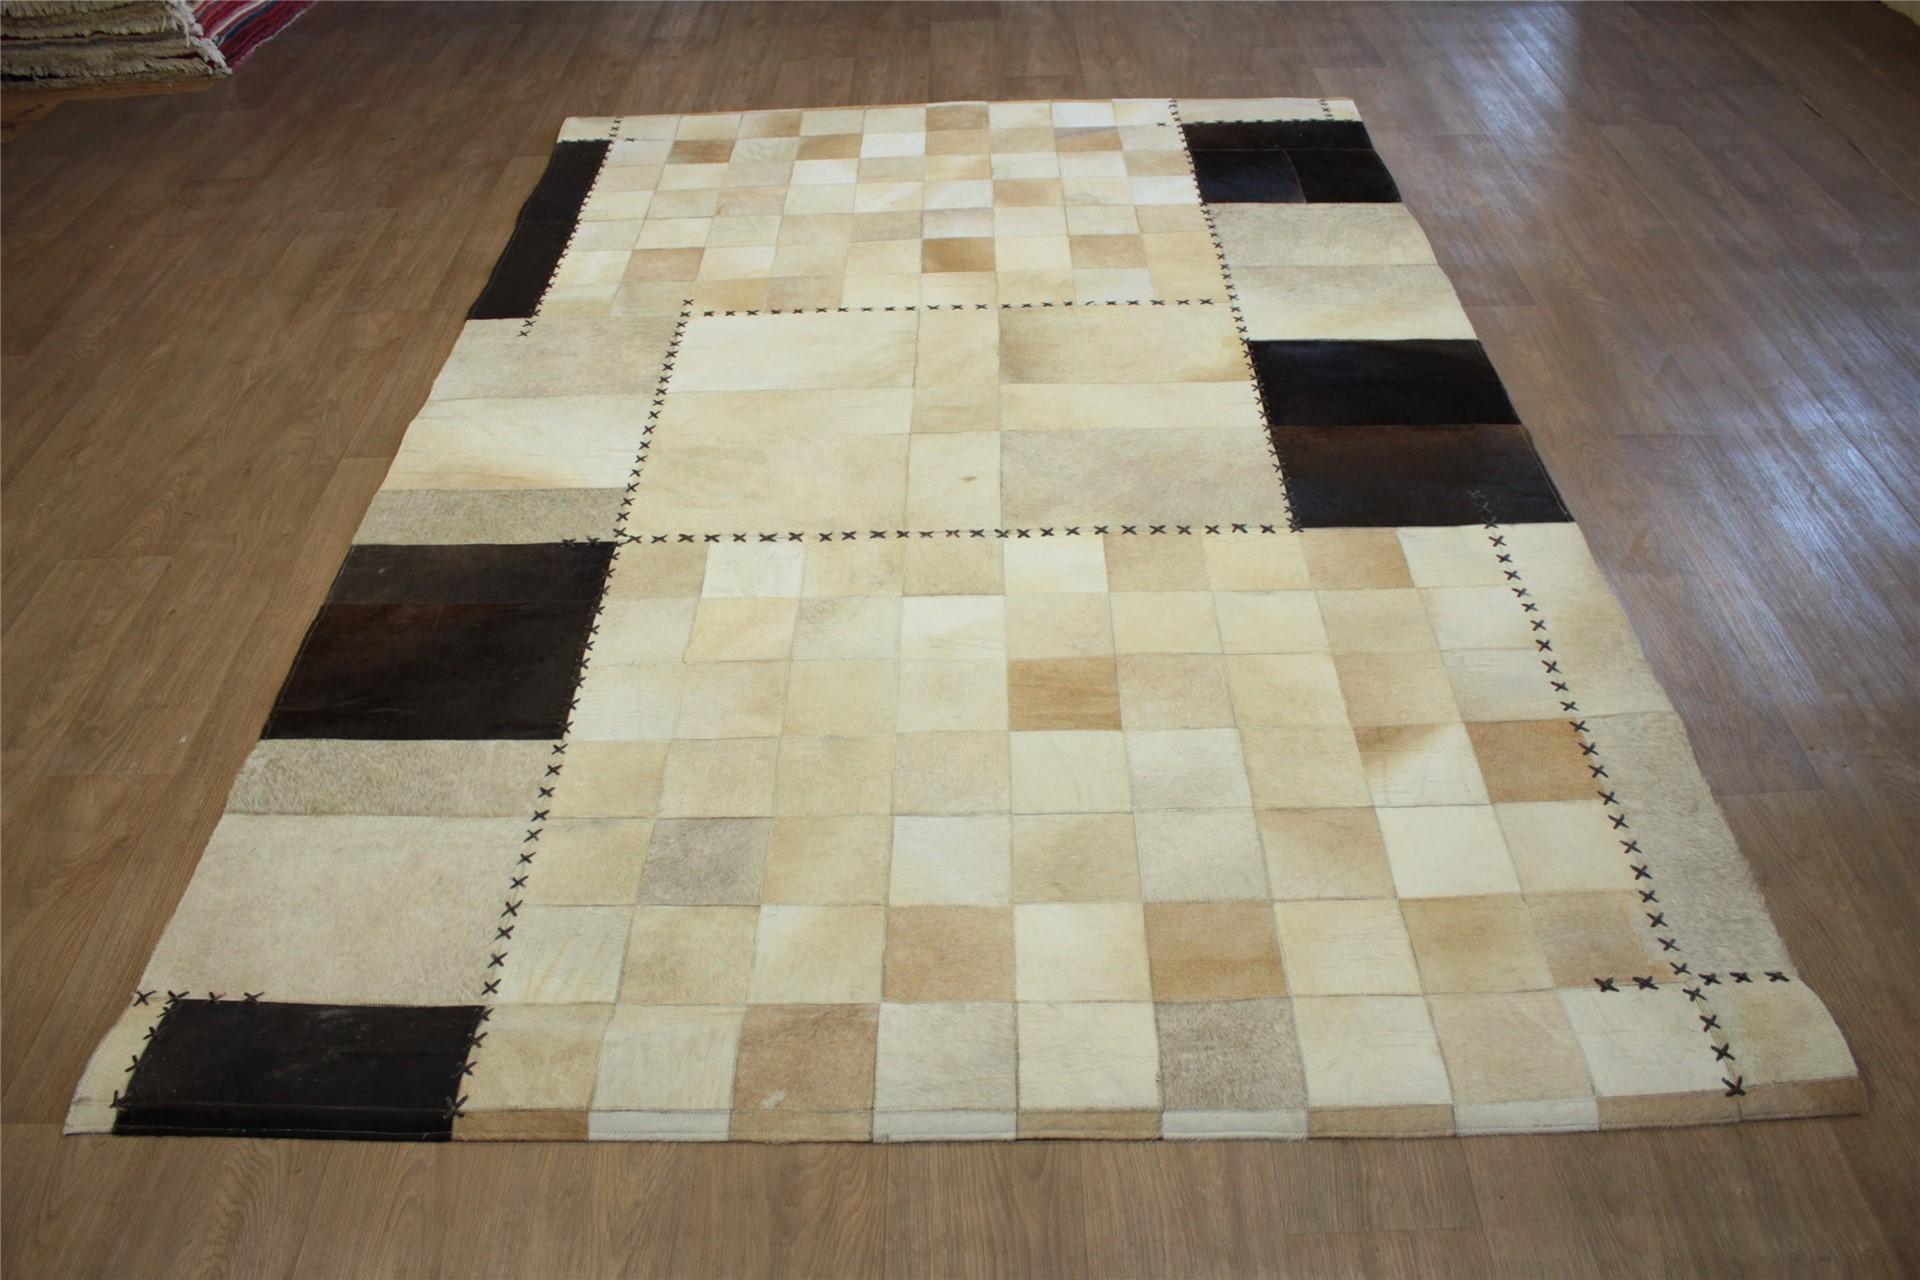 teppich echt leder patchwork 190x290 cm cowhide kuhfell braun beige ebay. Black Bedroom Furniture Sets. Home Design Ideas